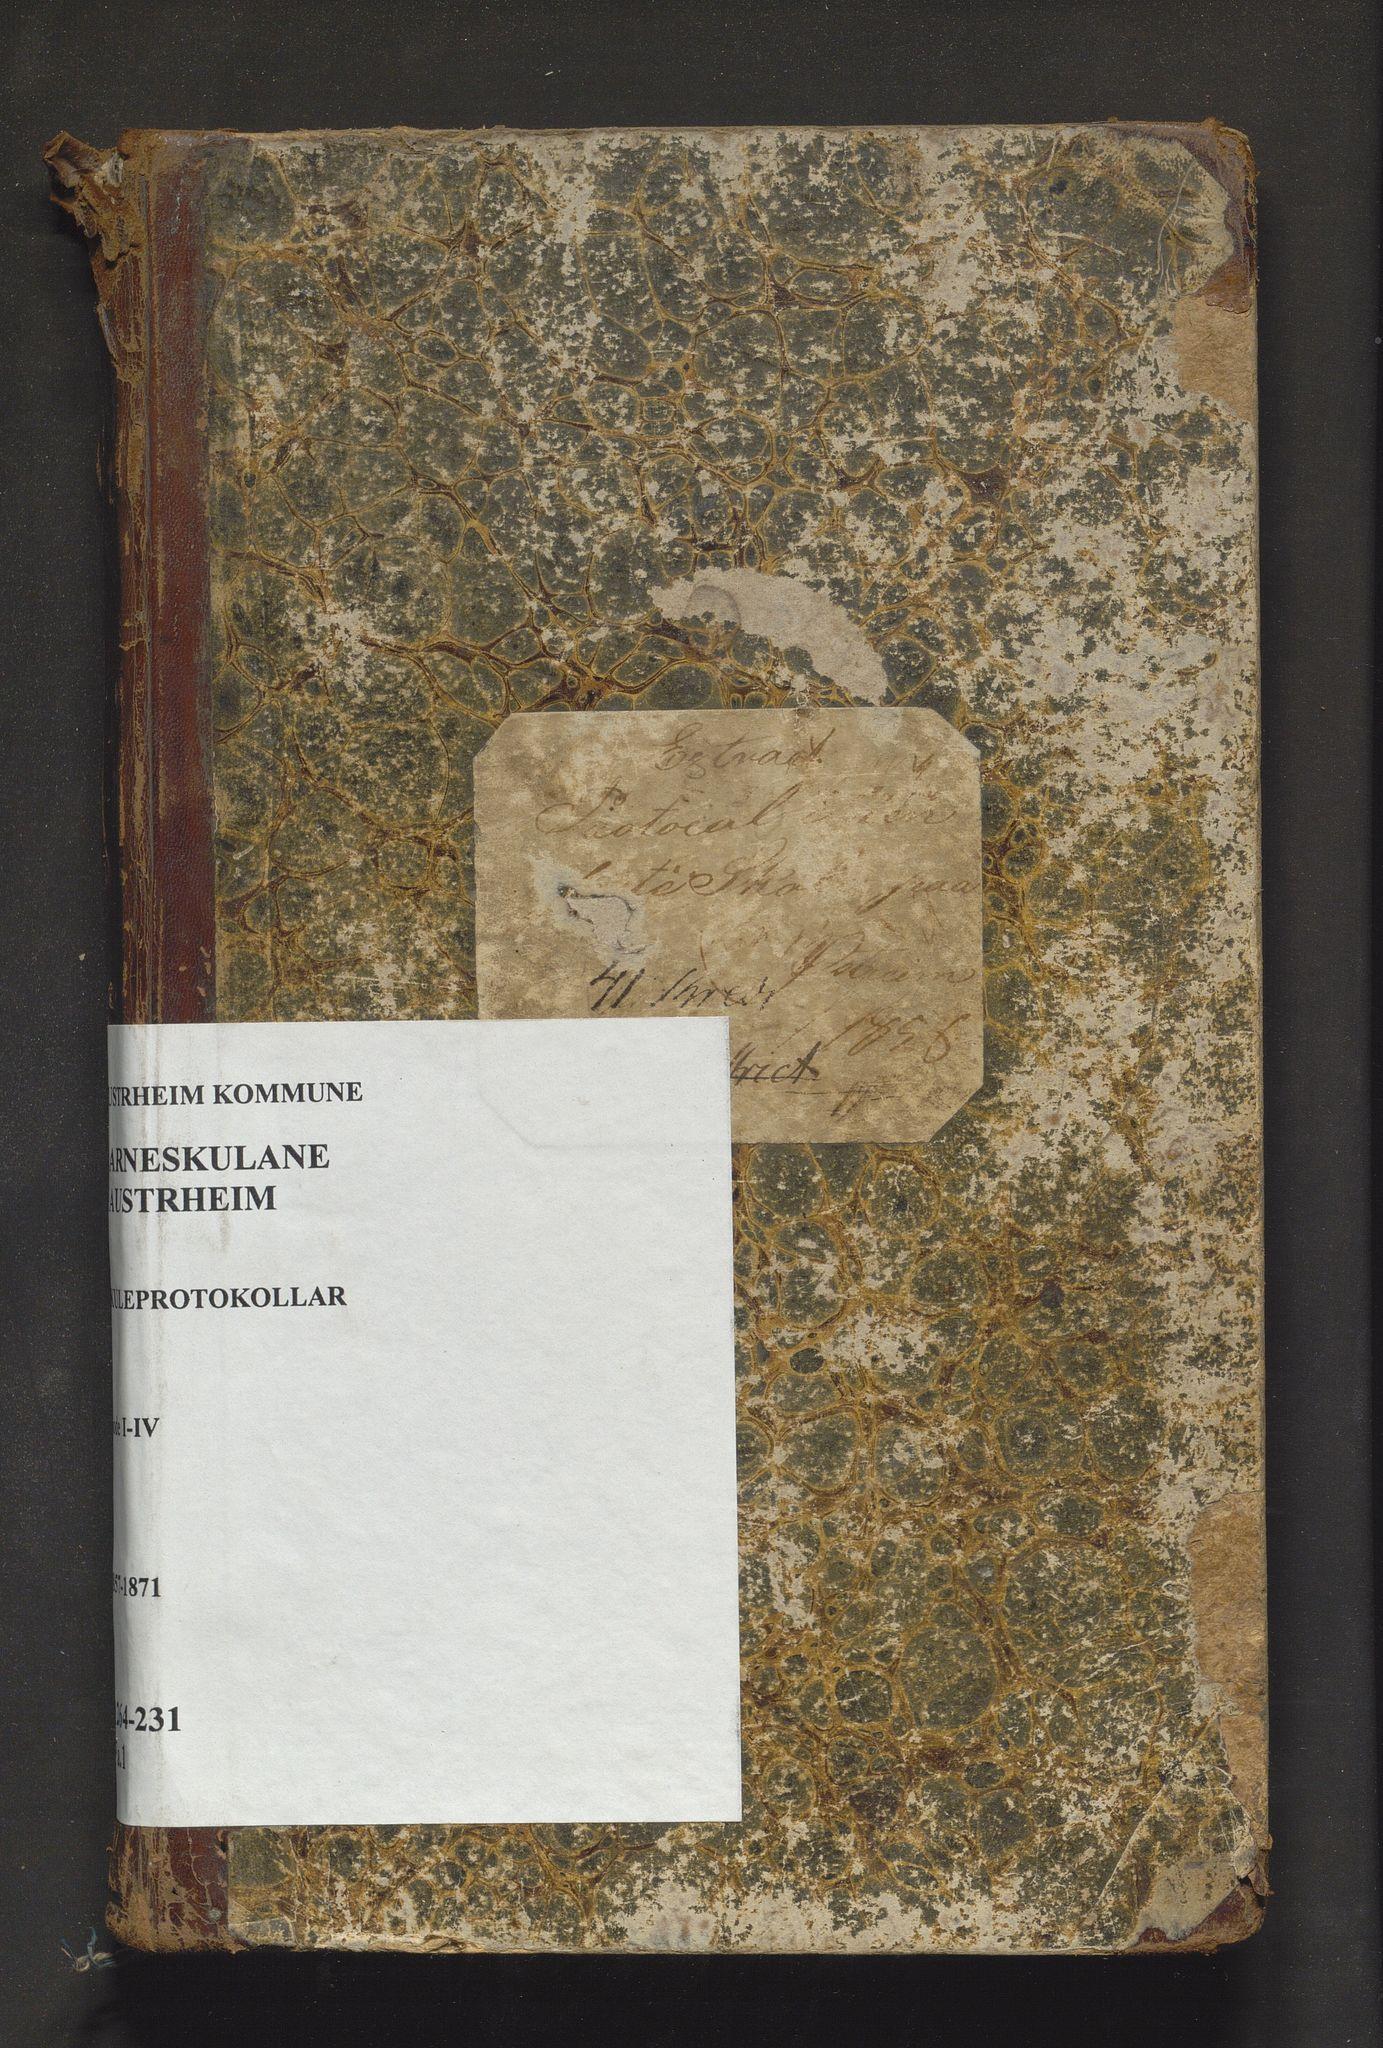 IKAH, Austrheim kommune. Barneskulane, F/Fa/L0001: Skuleprotokoll for omgangsskulen i Rode 1-4, 1857-1871